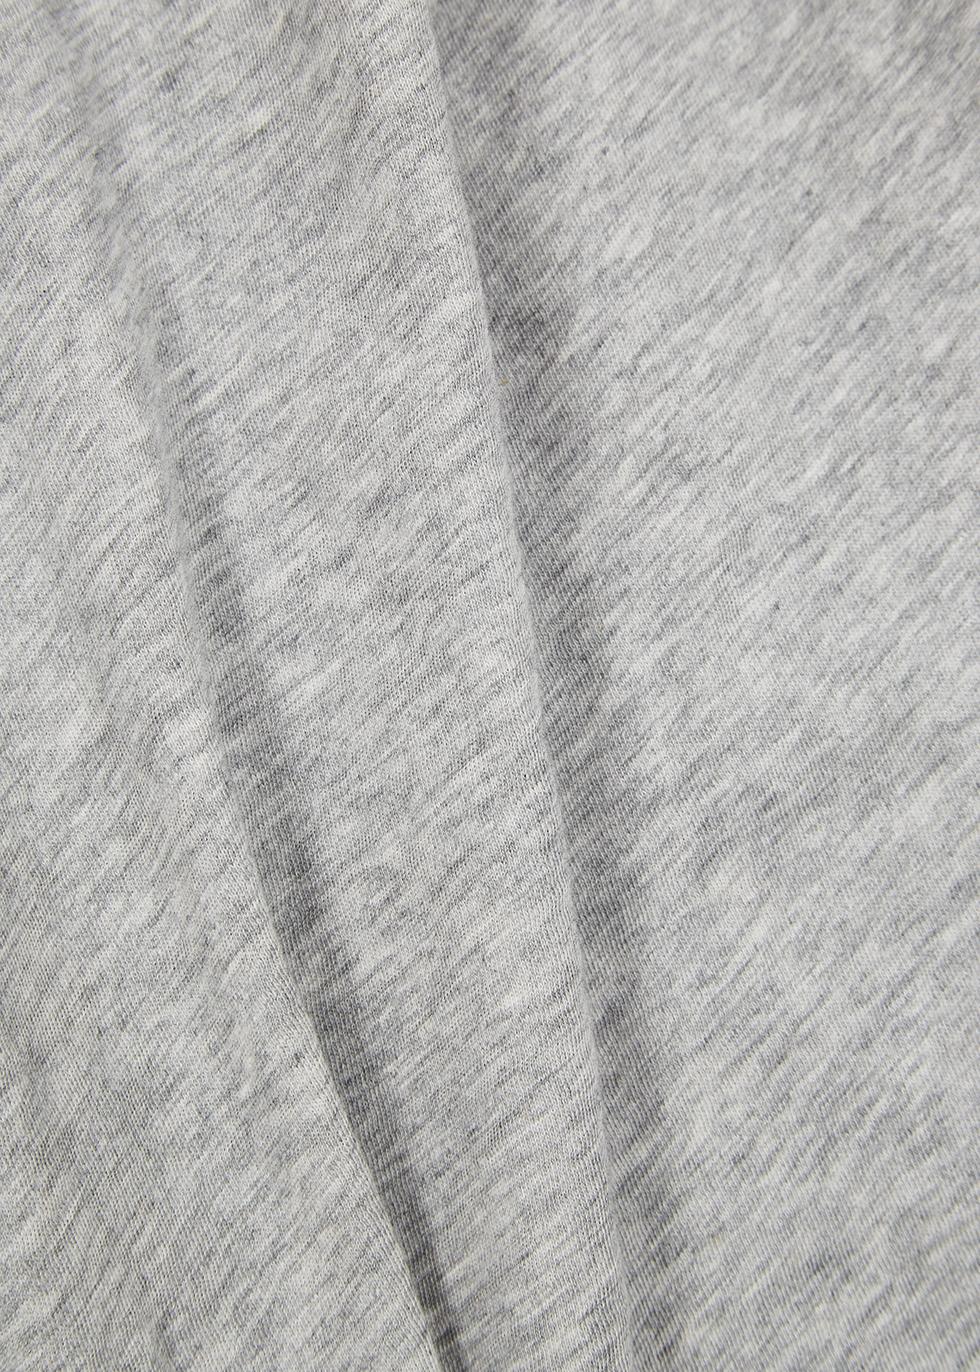 The Tee grey cotton T-shirt - rag & bone